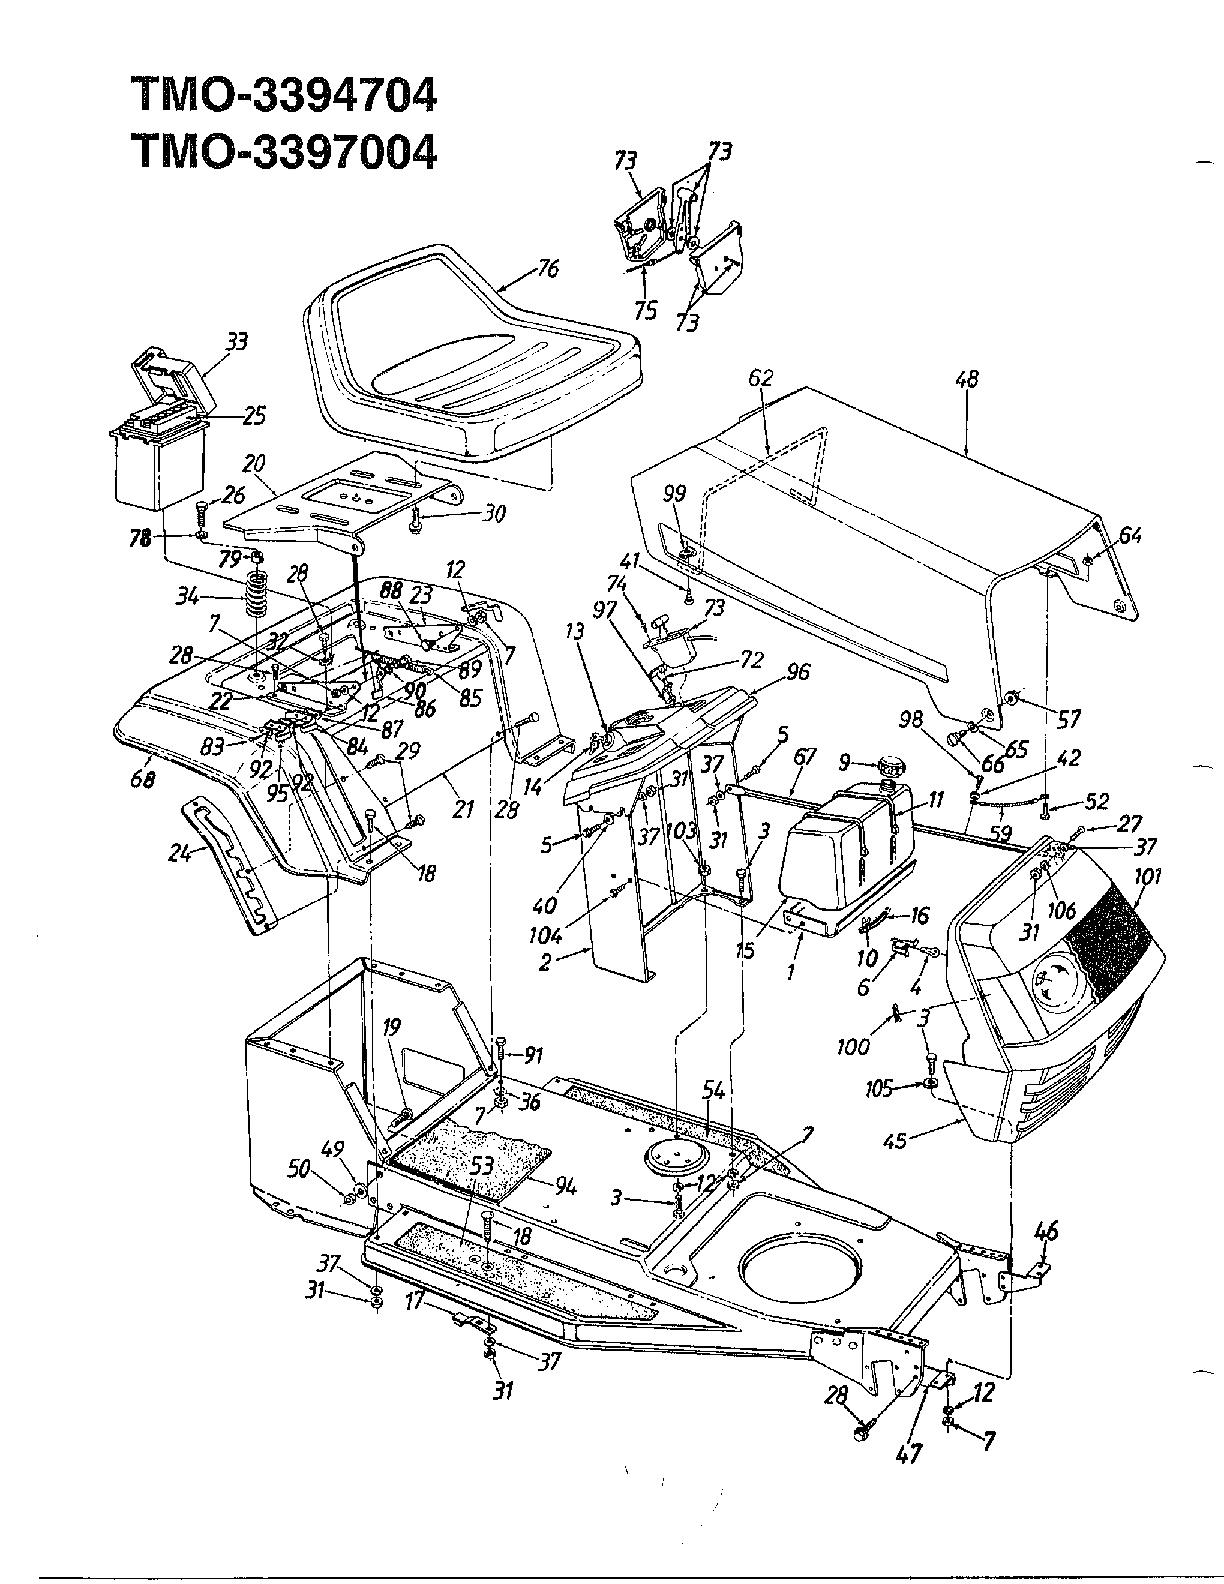 hight resolution of mtd tractor diagram wiring diagram used bolens mtd lawn tractor belt diagram mtd lawn tractor diagram